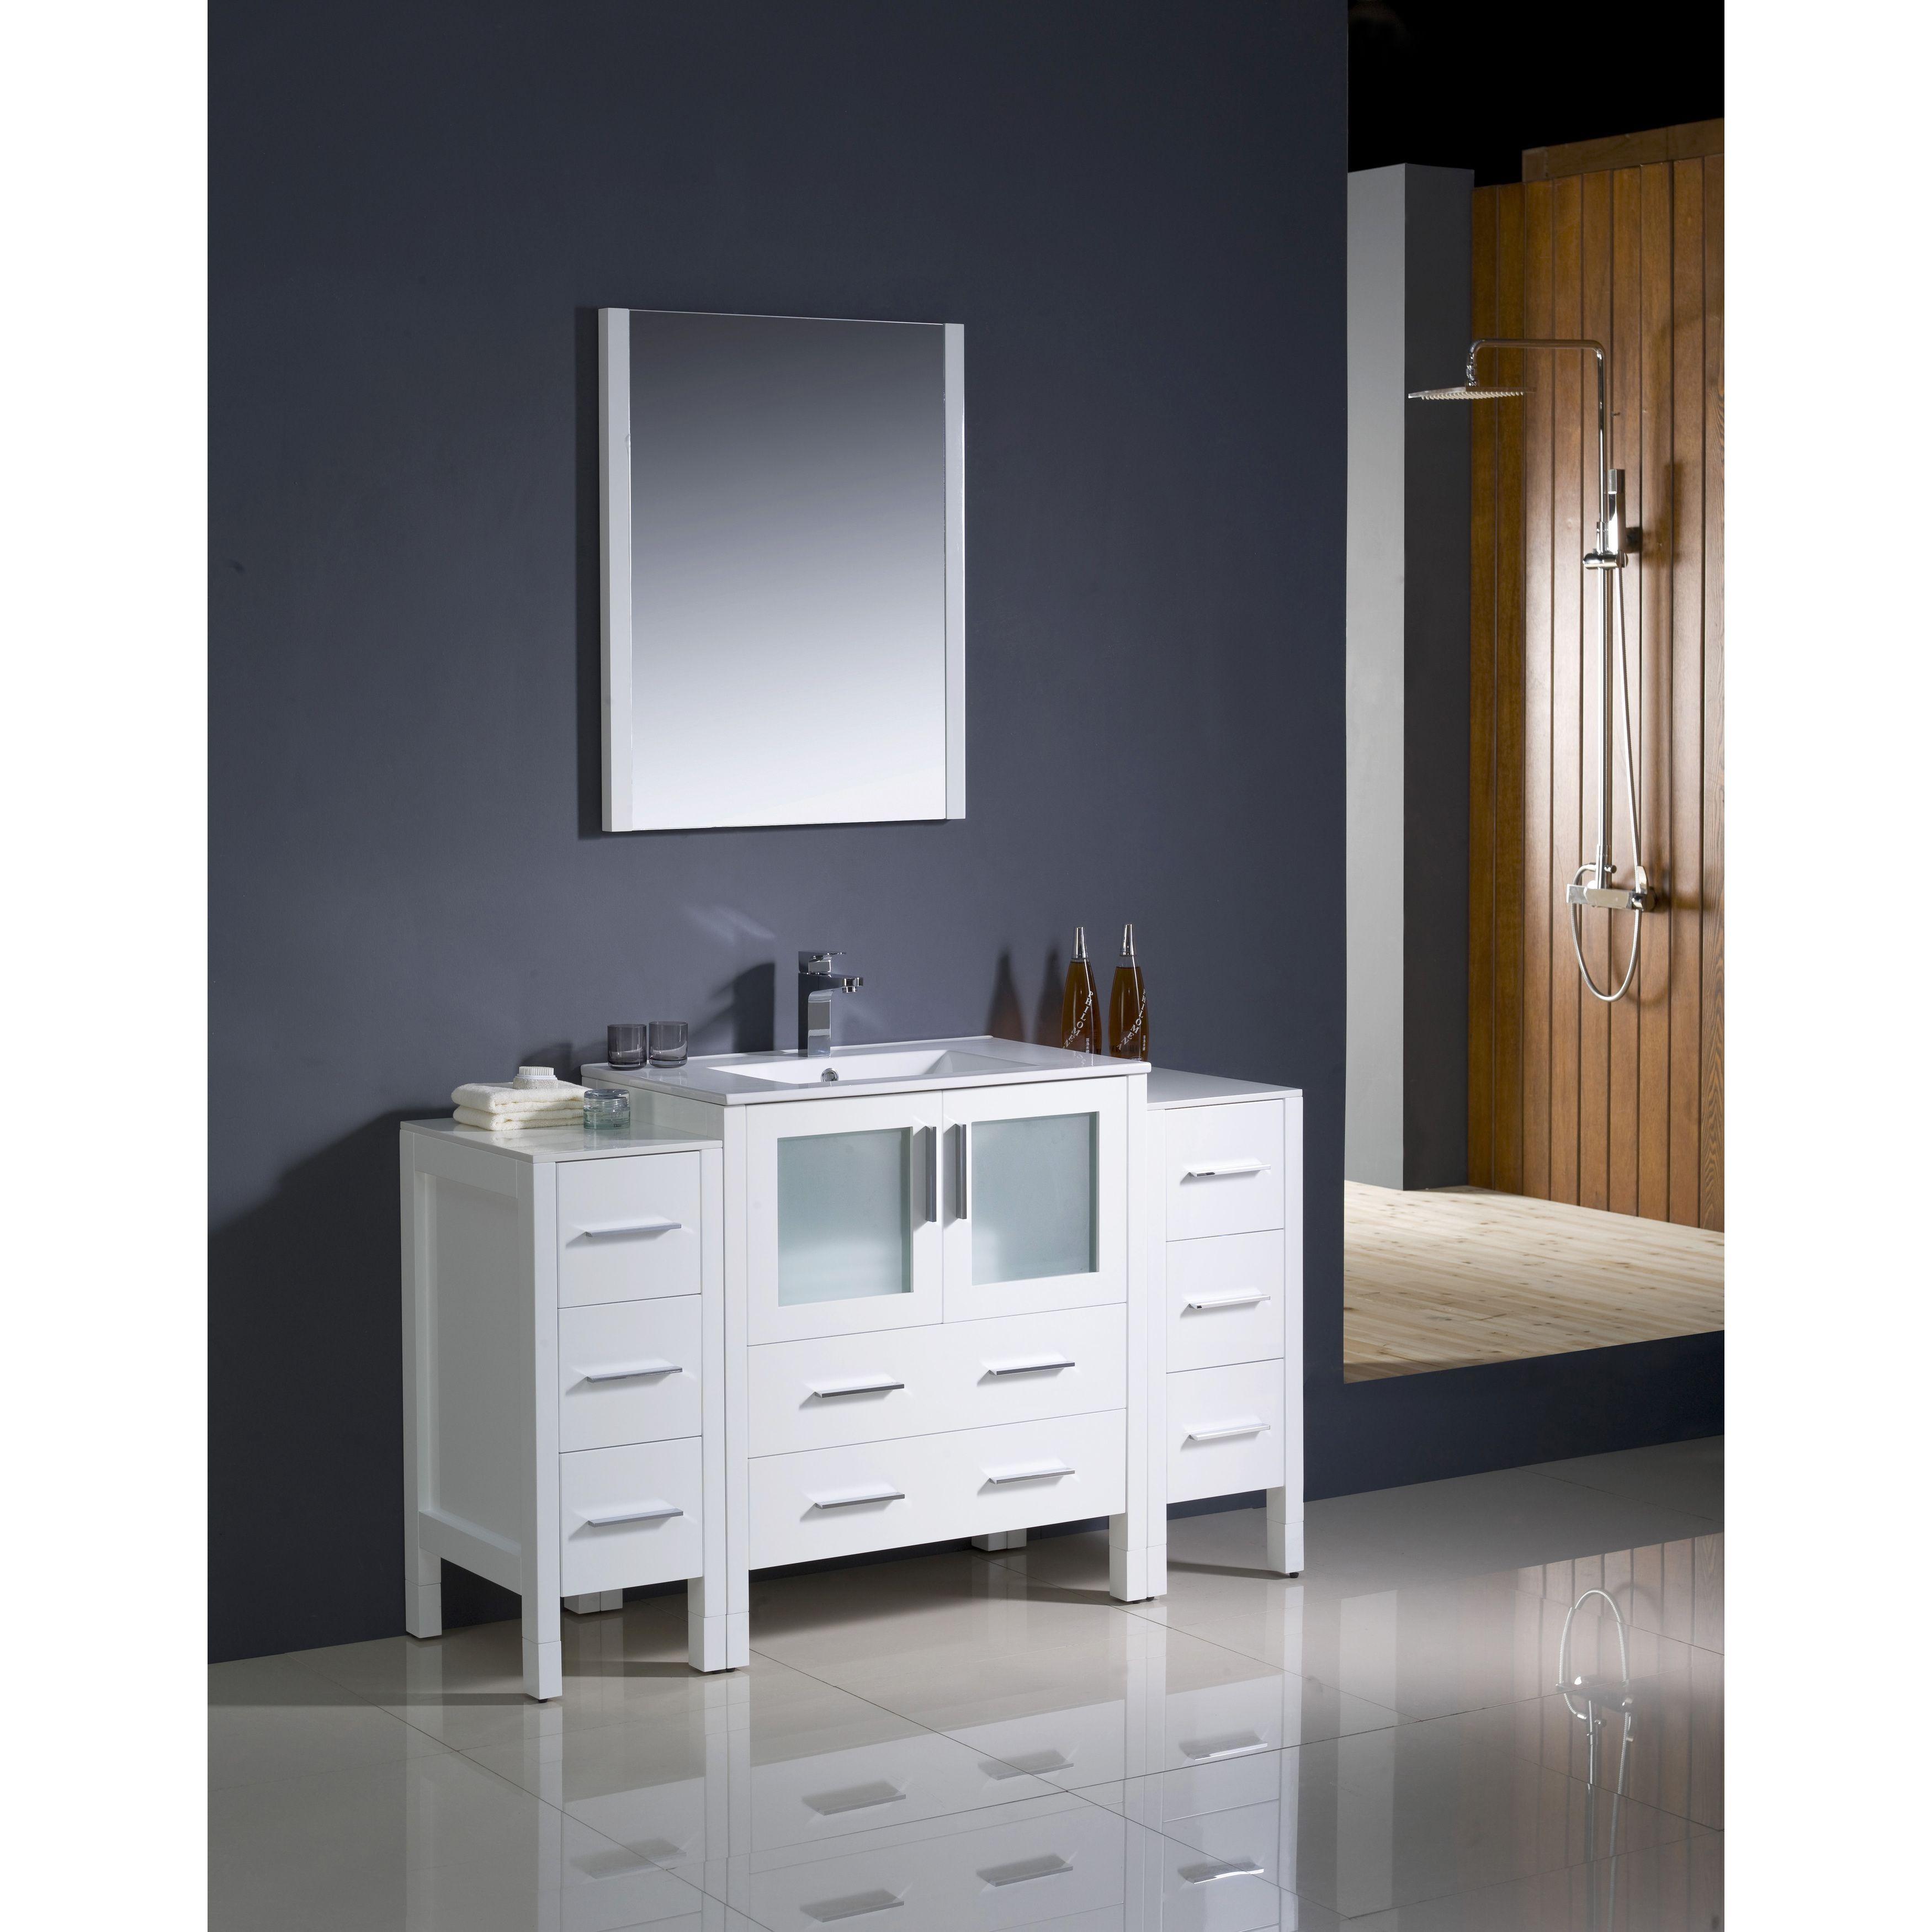 Fresca torino inch modern bathroom vanity with side cabinets